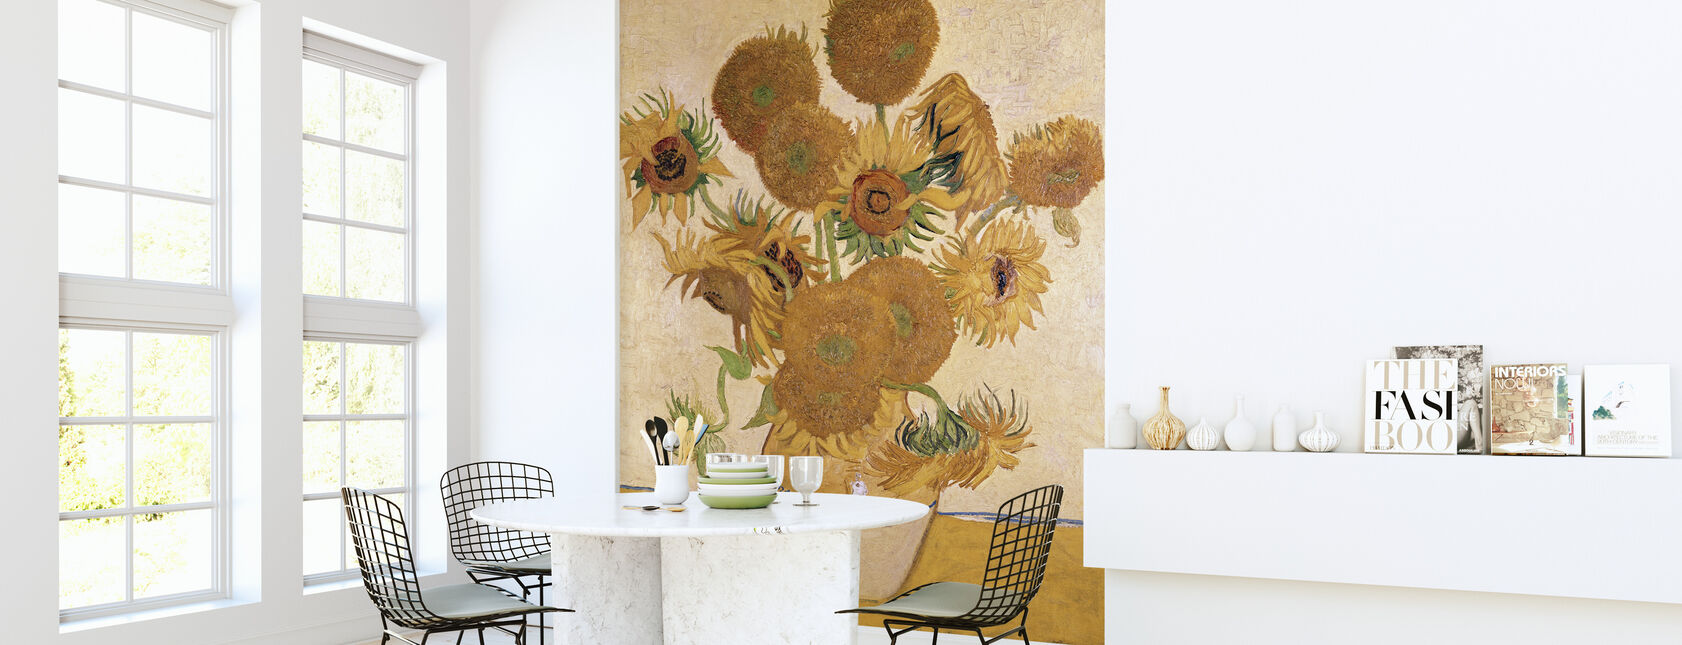 Sunflowers - Vincent van Gogh - Wallpaper - Kitchen